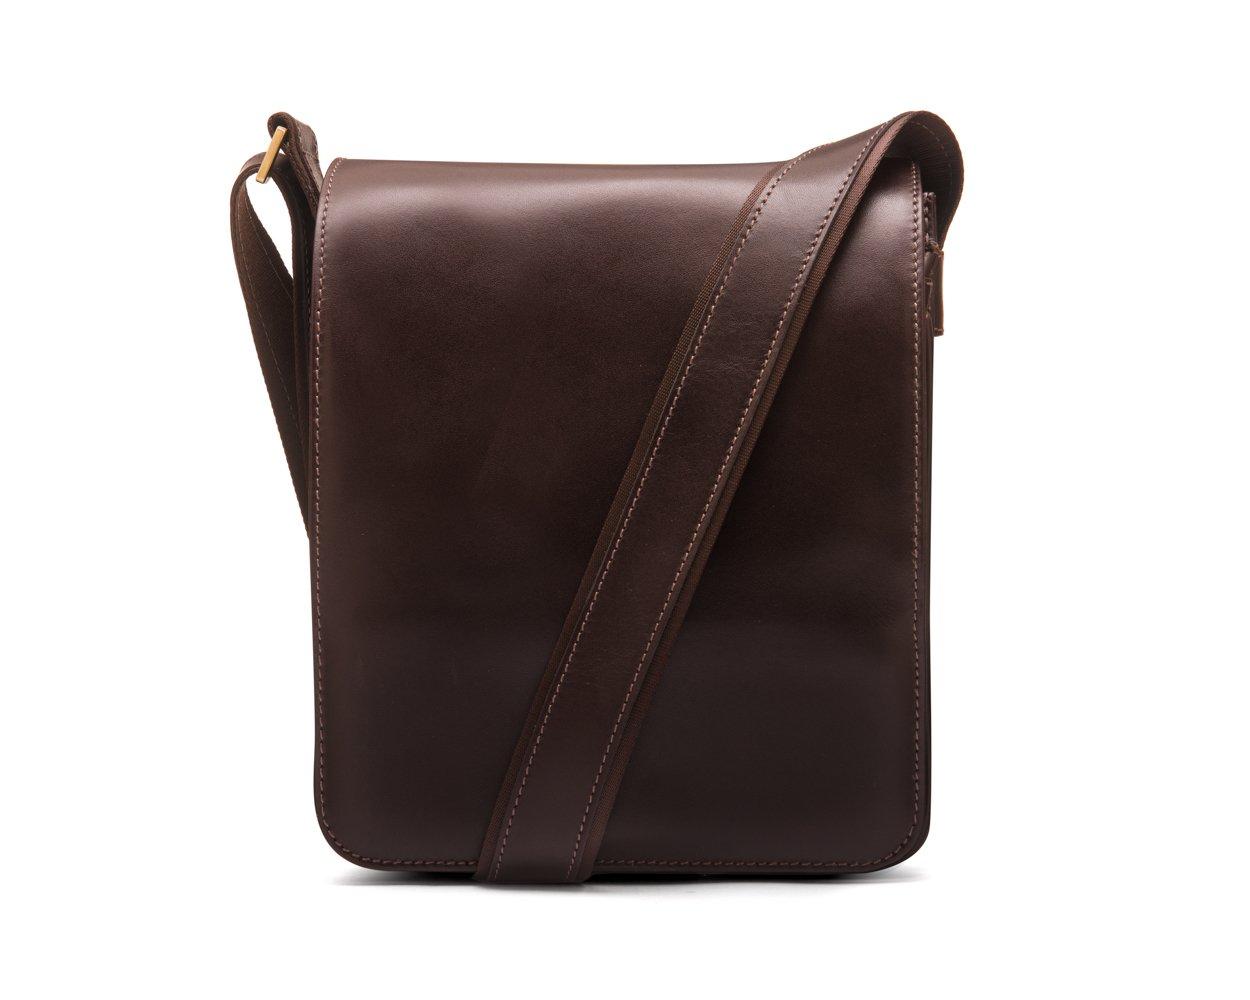 SAGEBROWN Brown A4 Portrait Messenger Bag